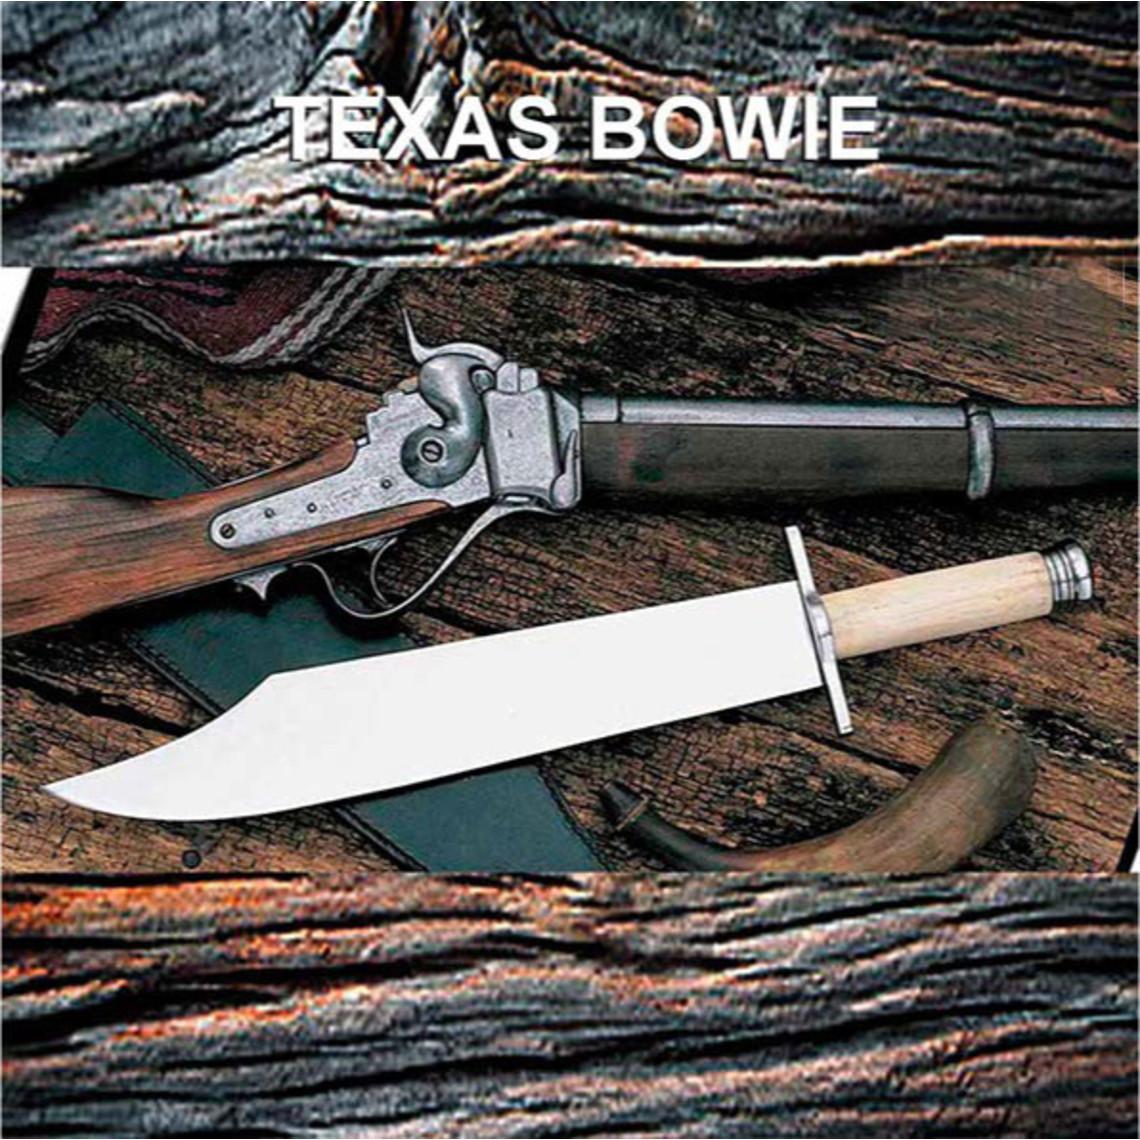 Windlass Steelcrafts Bowie knife Texas